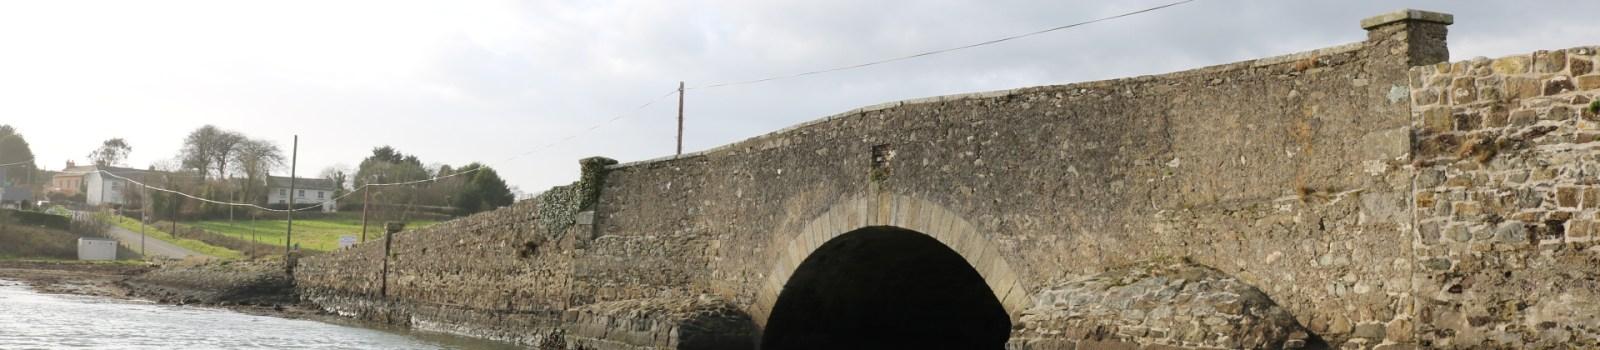 Tintern Bridge, Saltmills